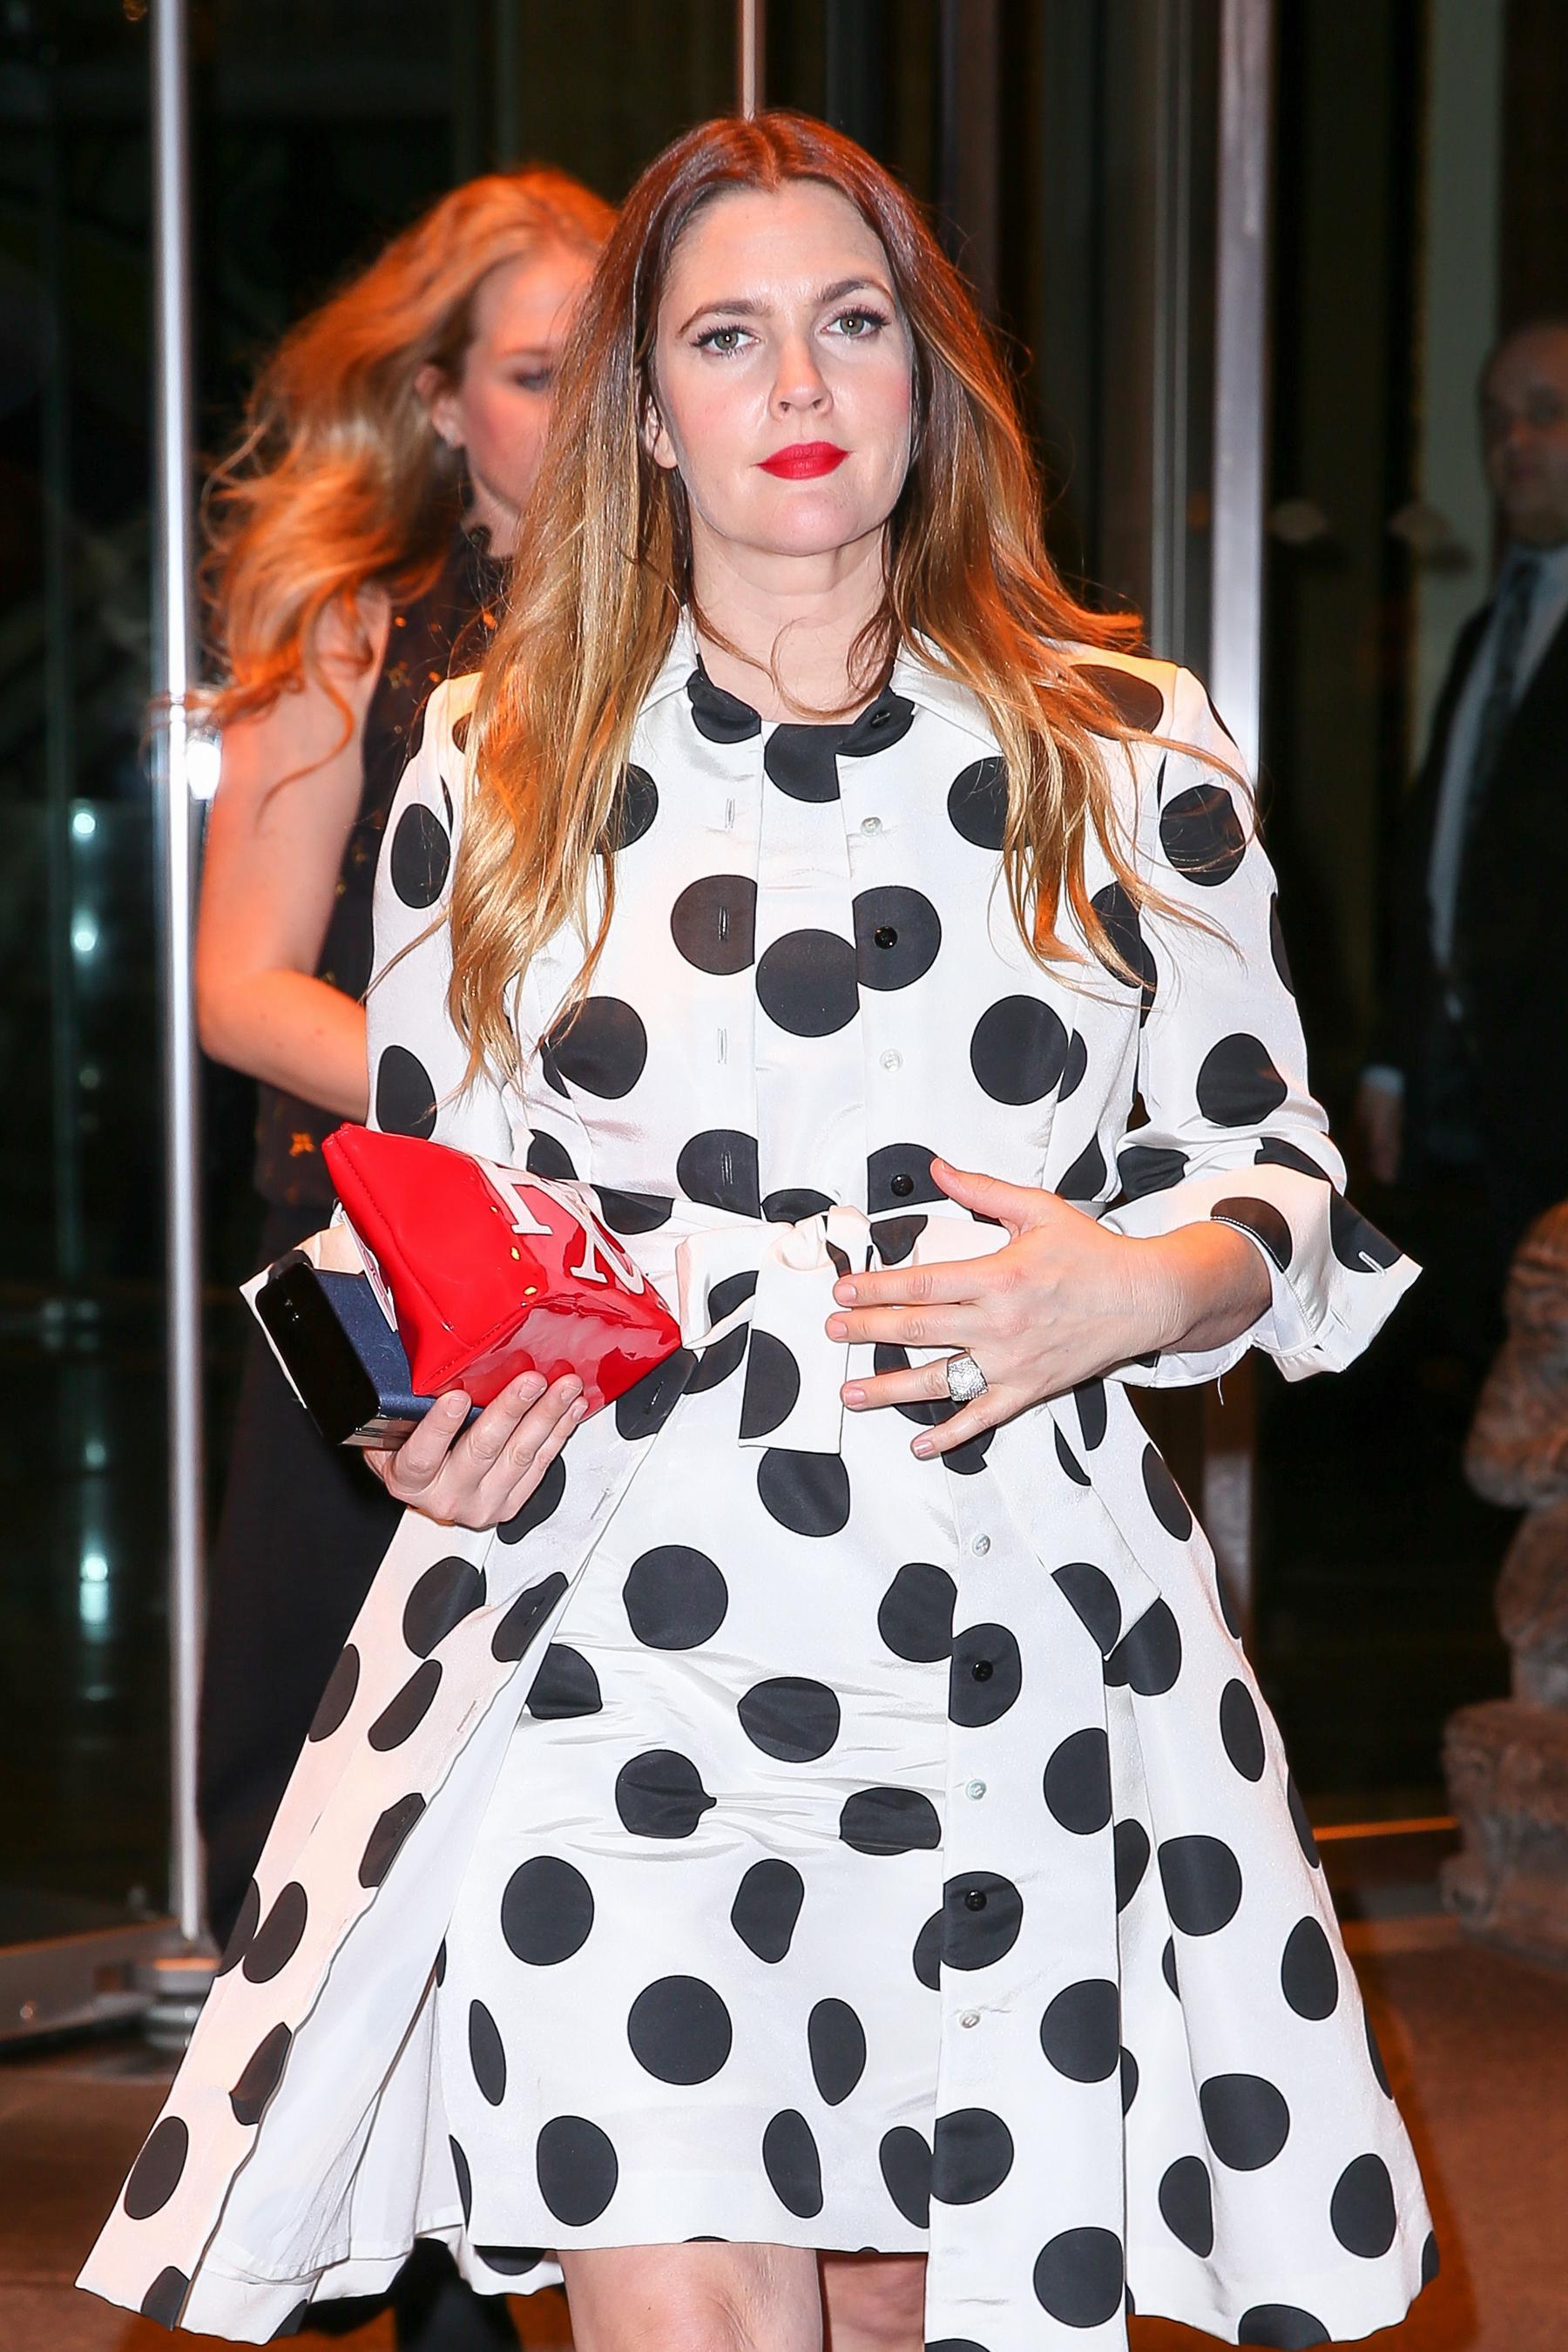 Drew Barrymore in New York City Jan-3